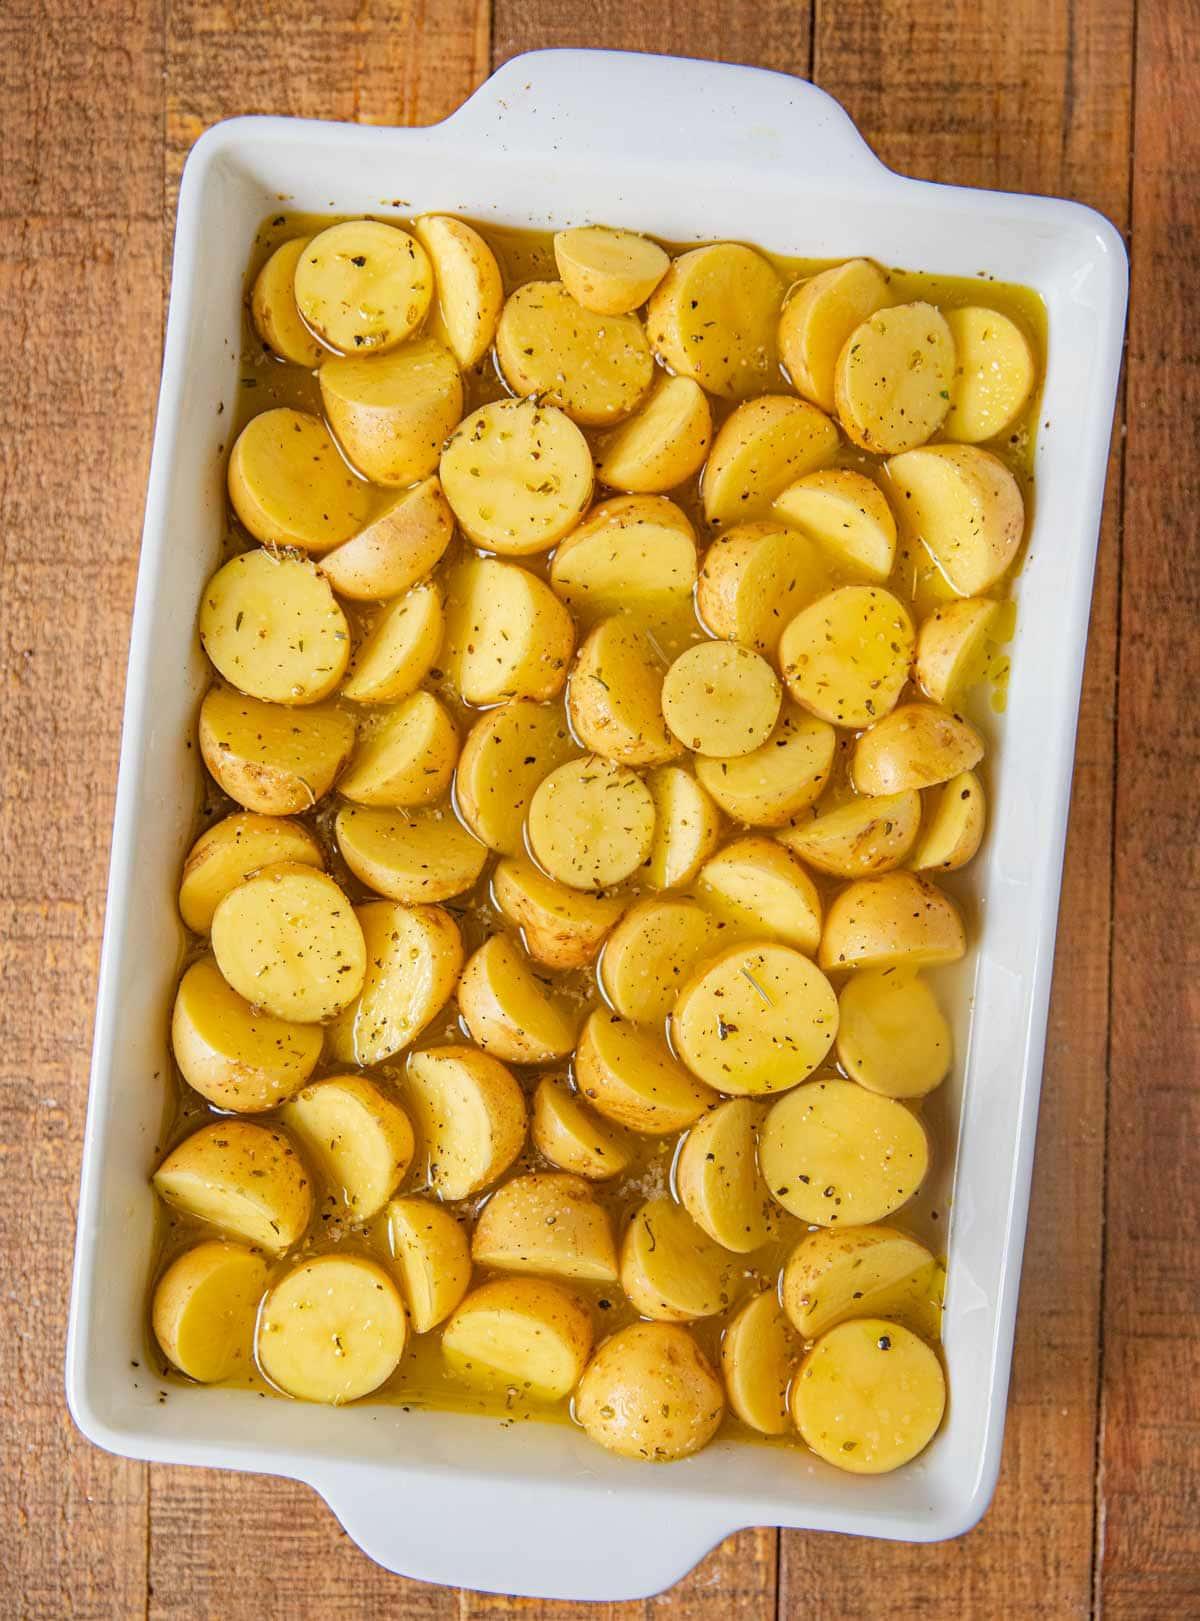 Greek Lemon Potatoes in baking dish before cooking